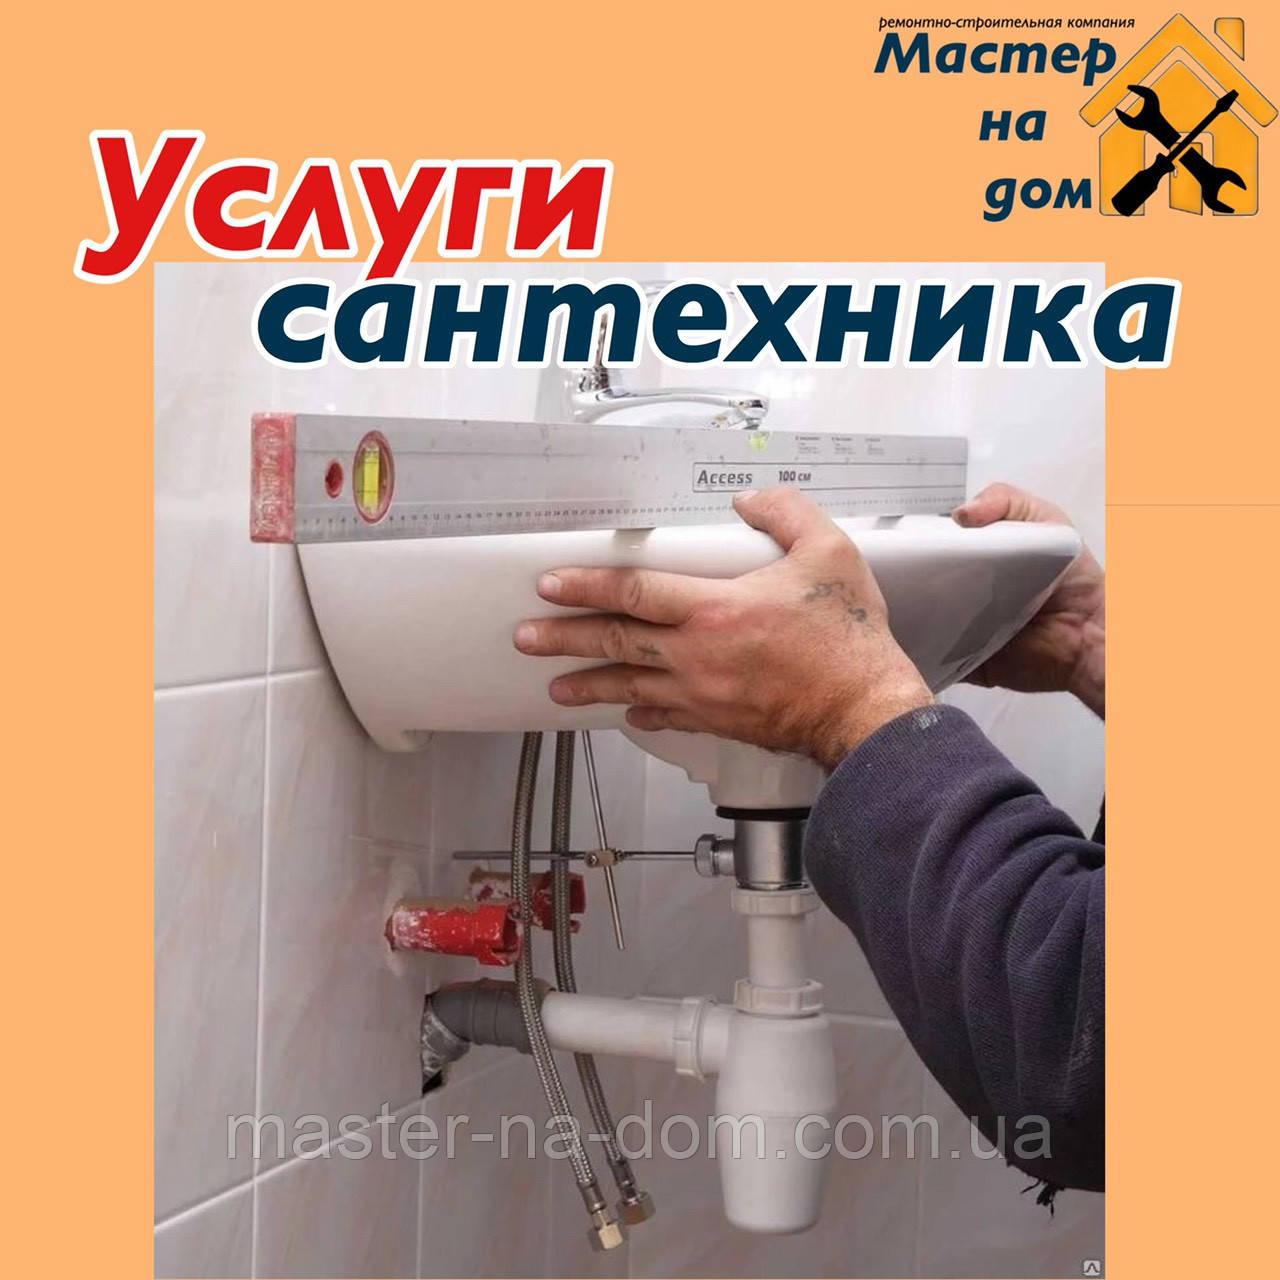 Услуги сантехника в Запорожье